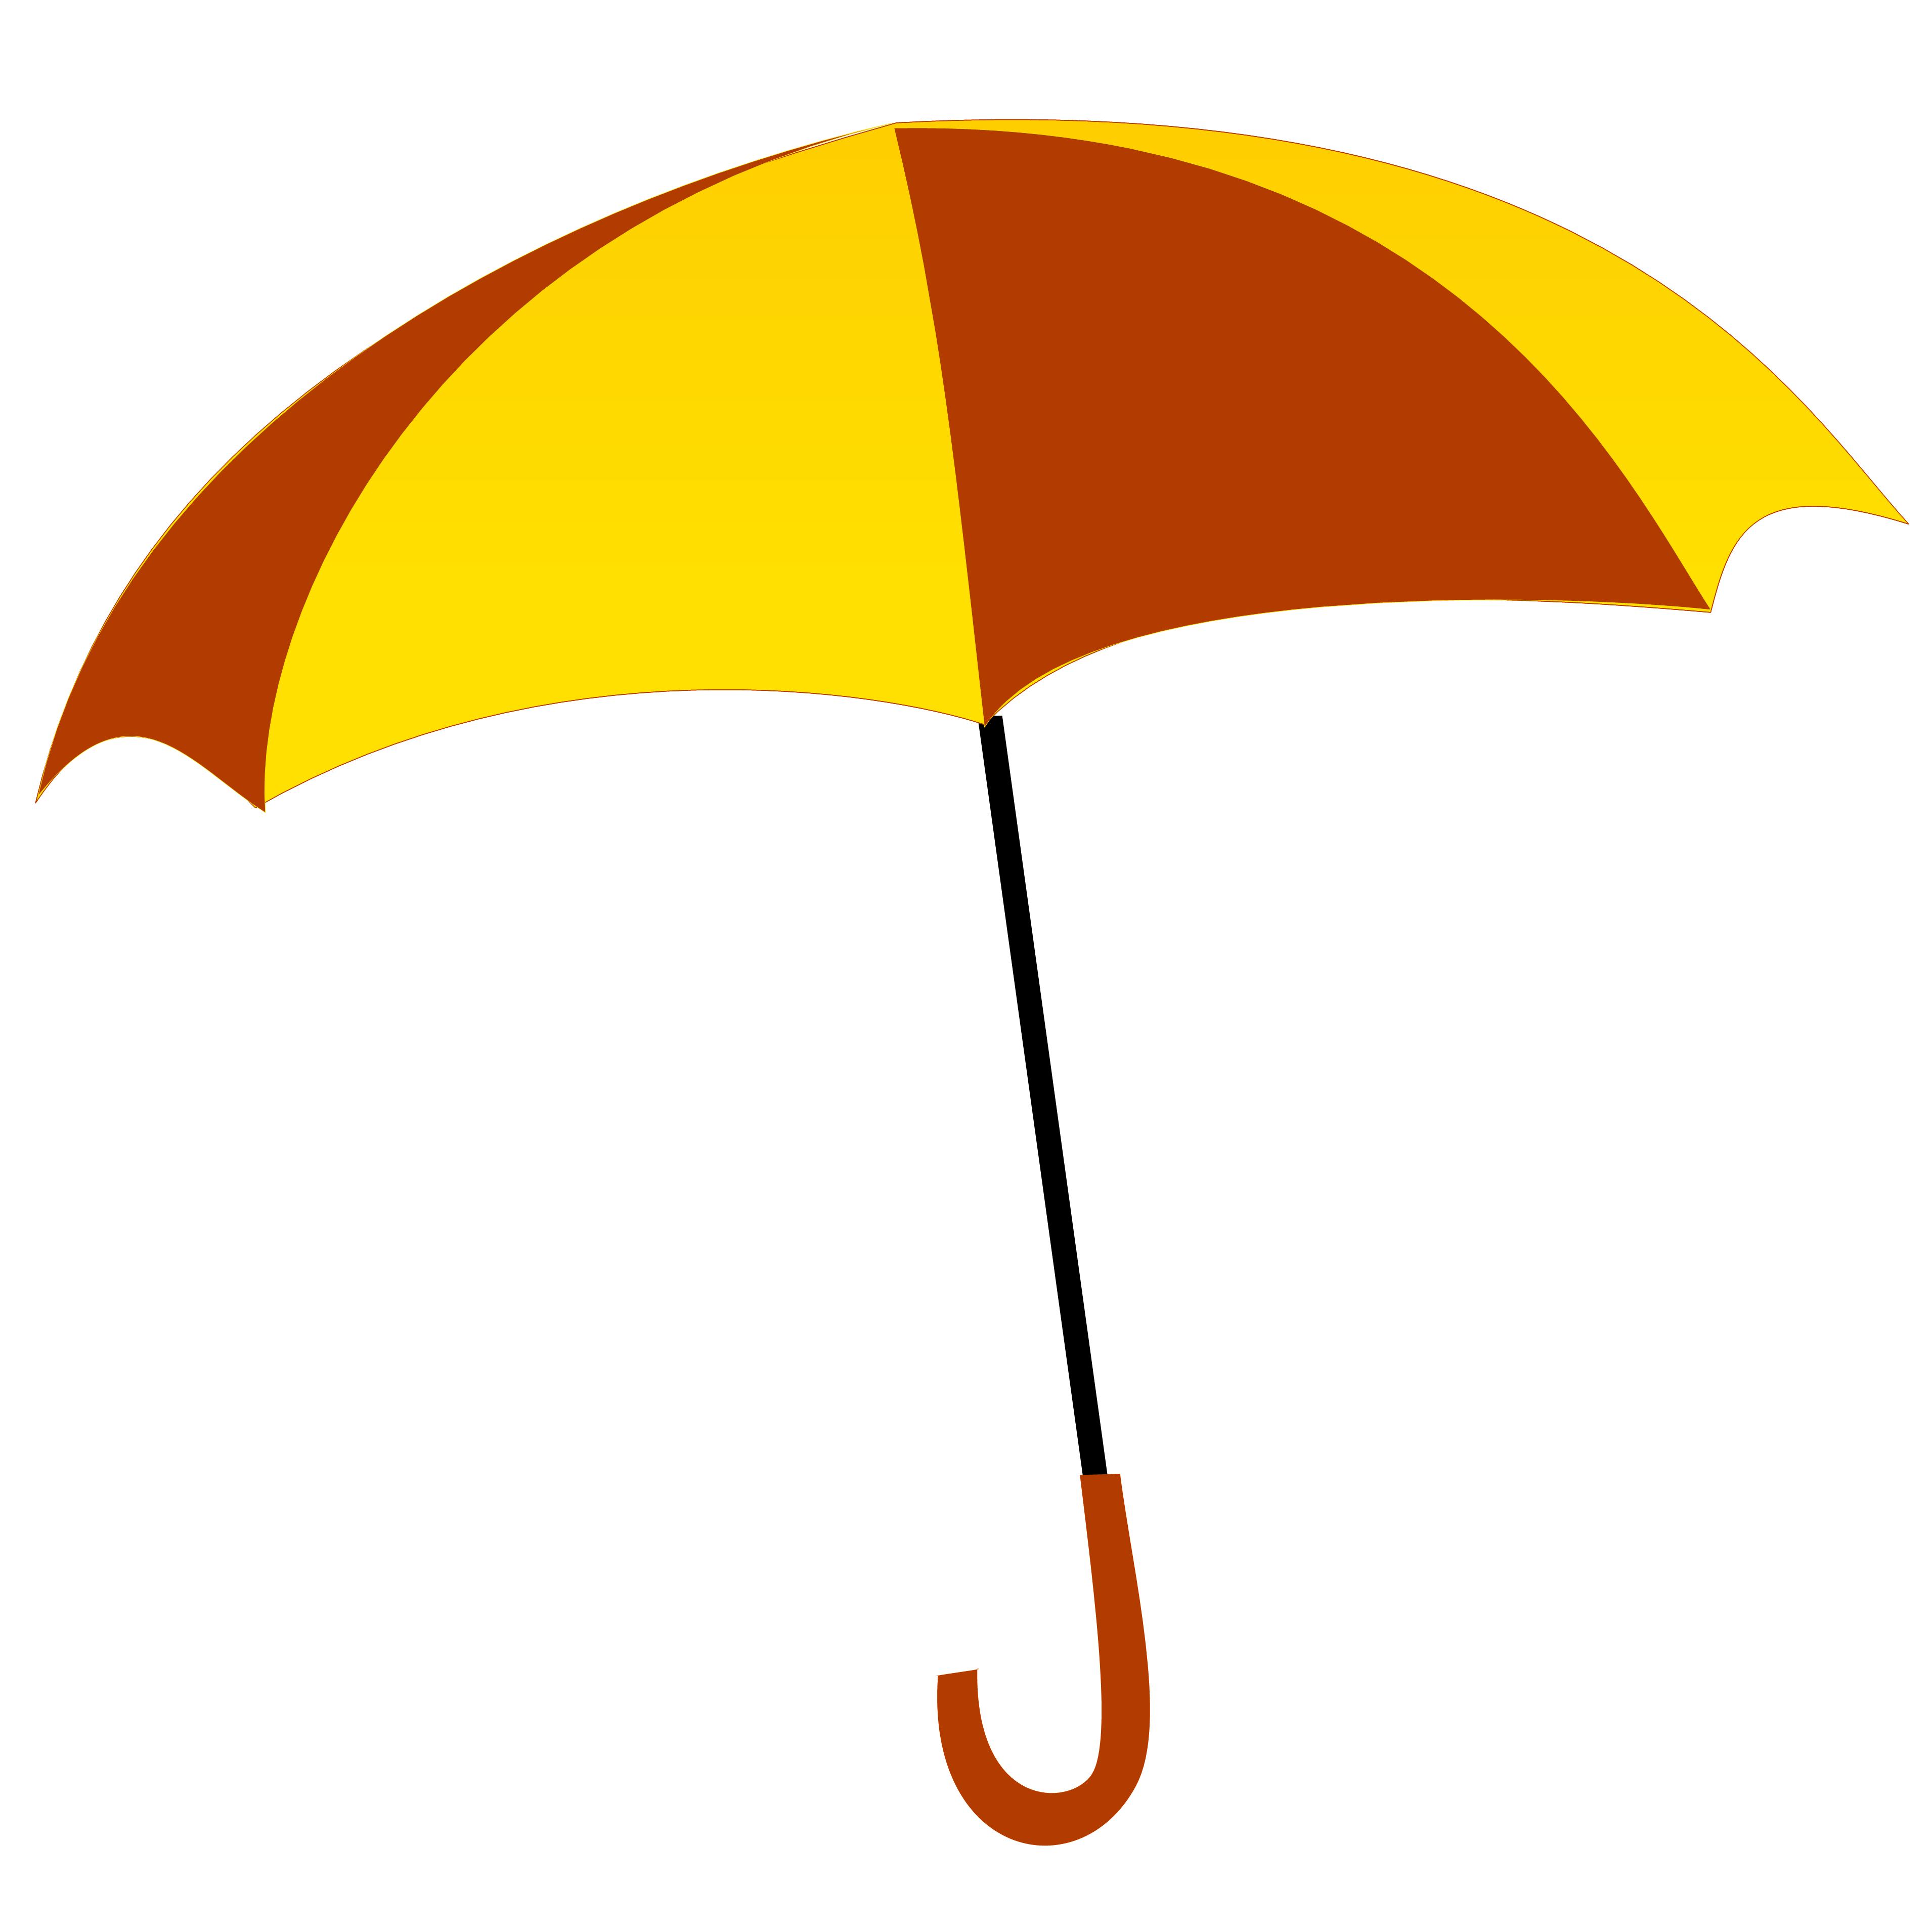 Clipart umbrella red object. Png transparent image pngpix